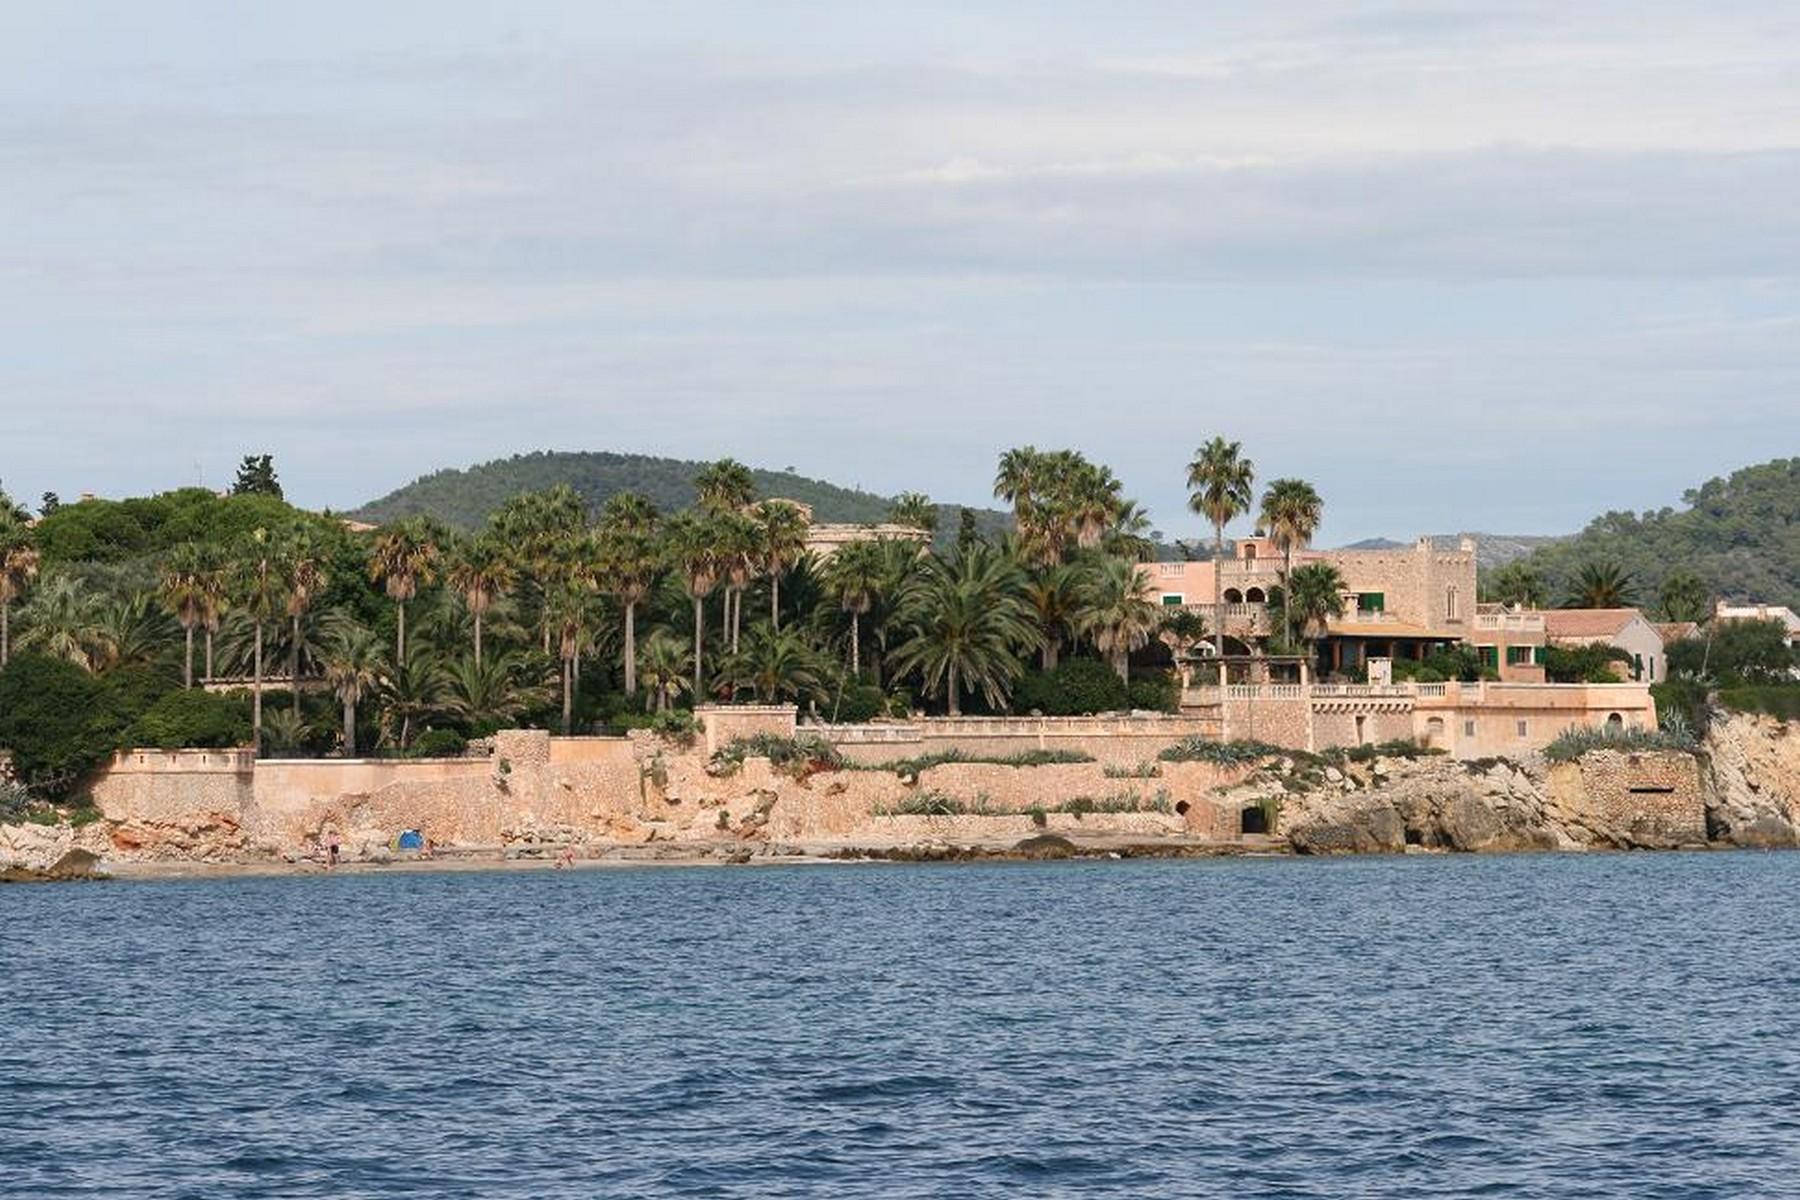 Single Family Home for Sale at Seafront Villa in Costa de los Pinos Costa De Los Pinos, Mallorca 07559 Spain